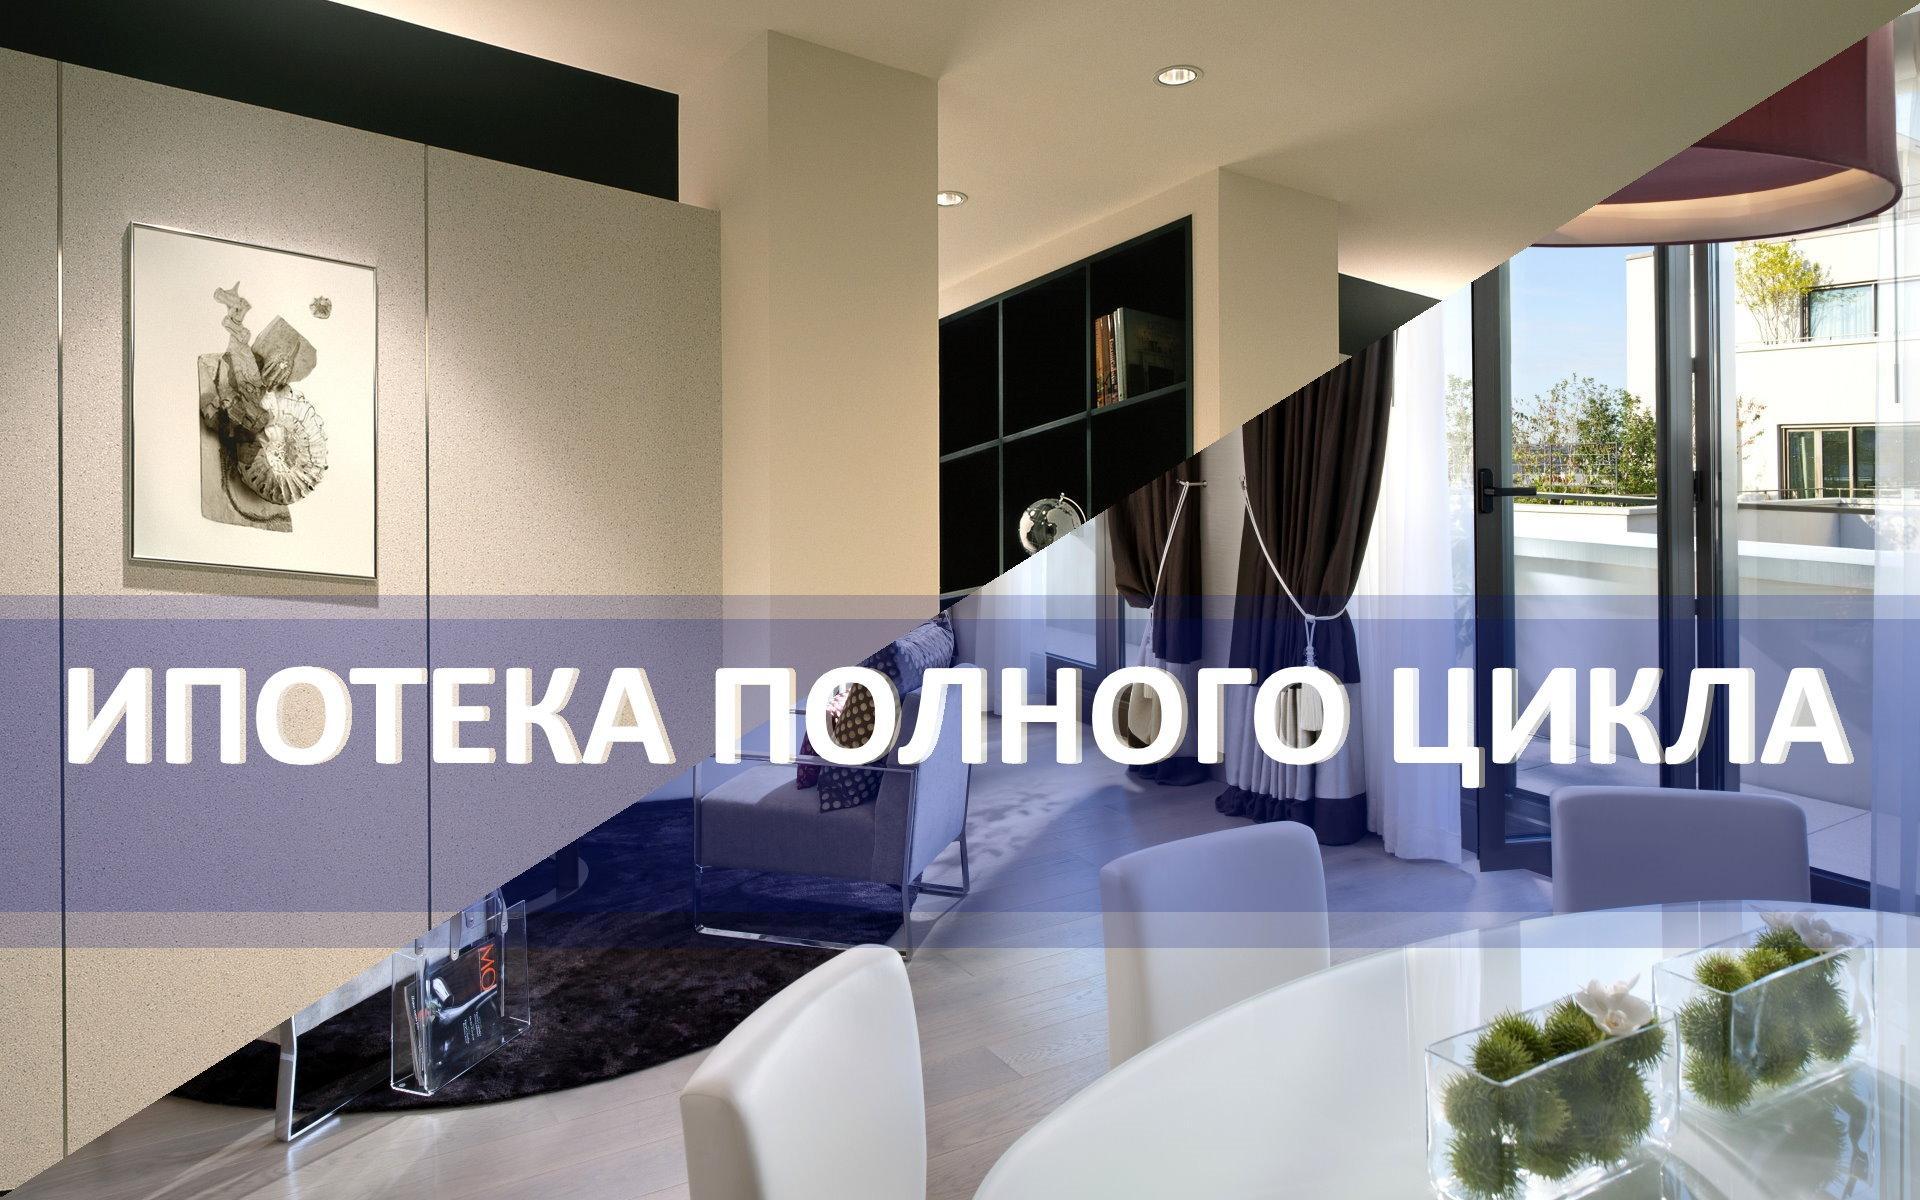 Заявку на кредит евразийский банк